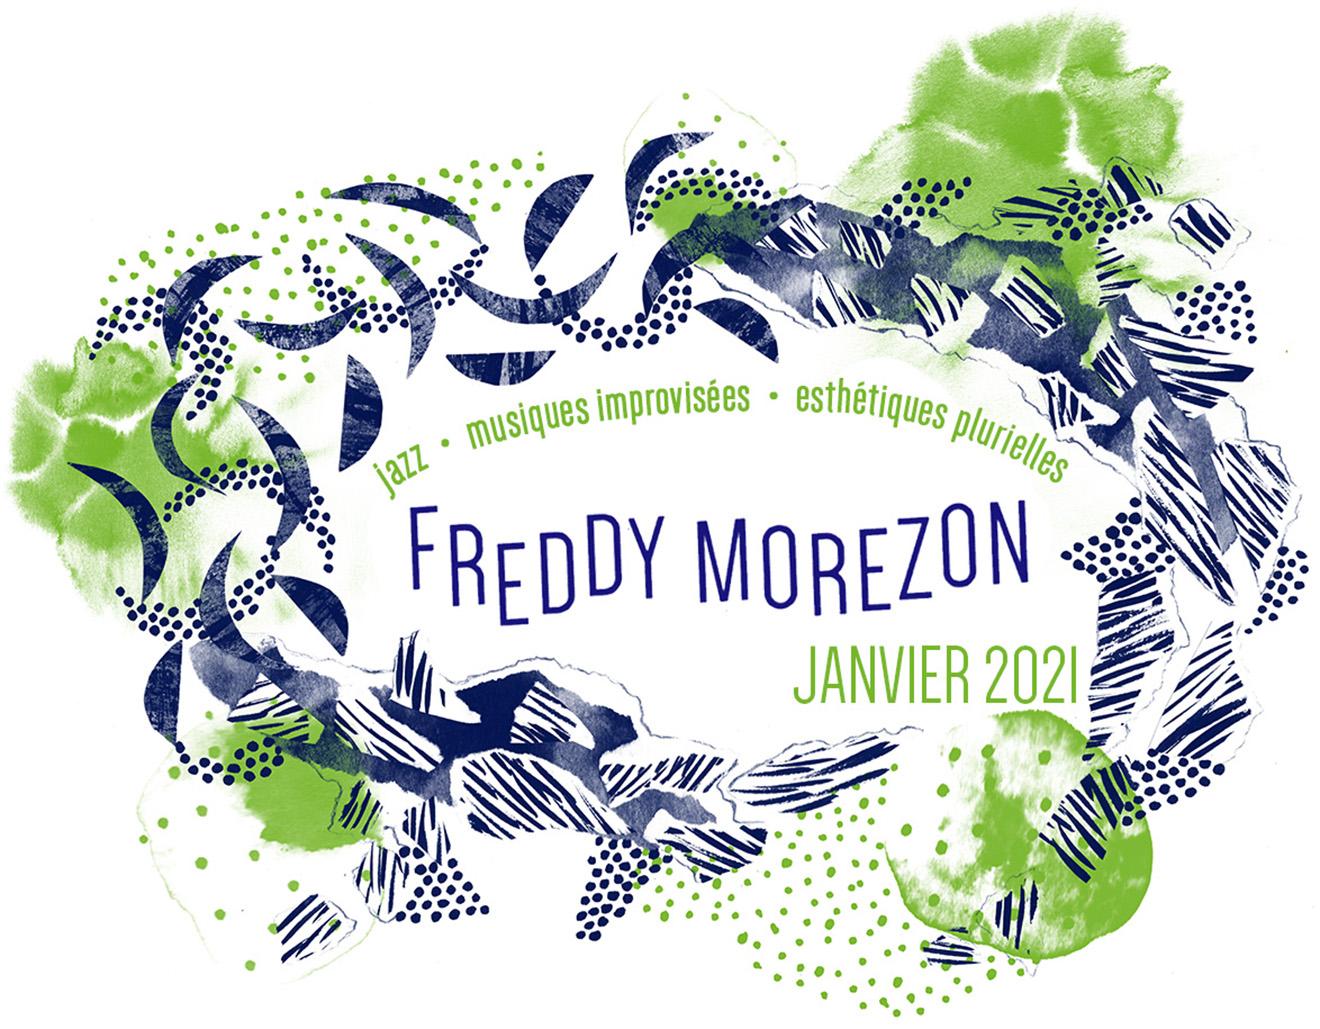 Freddy Morezon - Newsletter janvier 2021